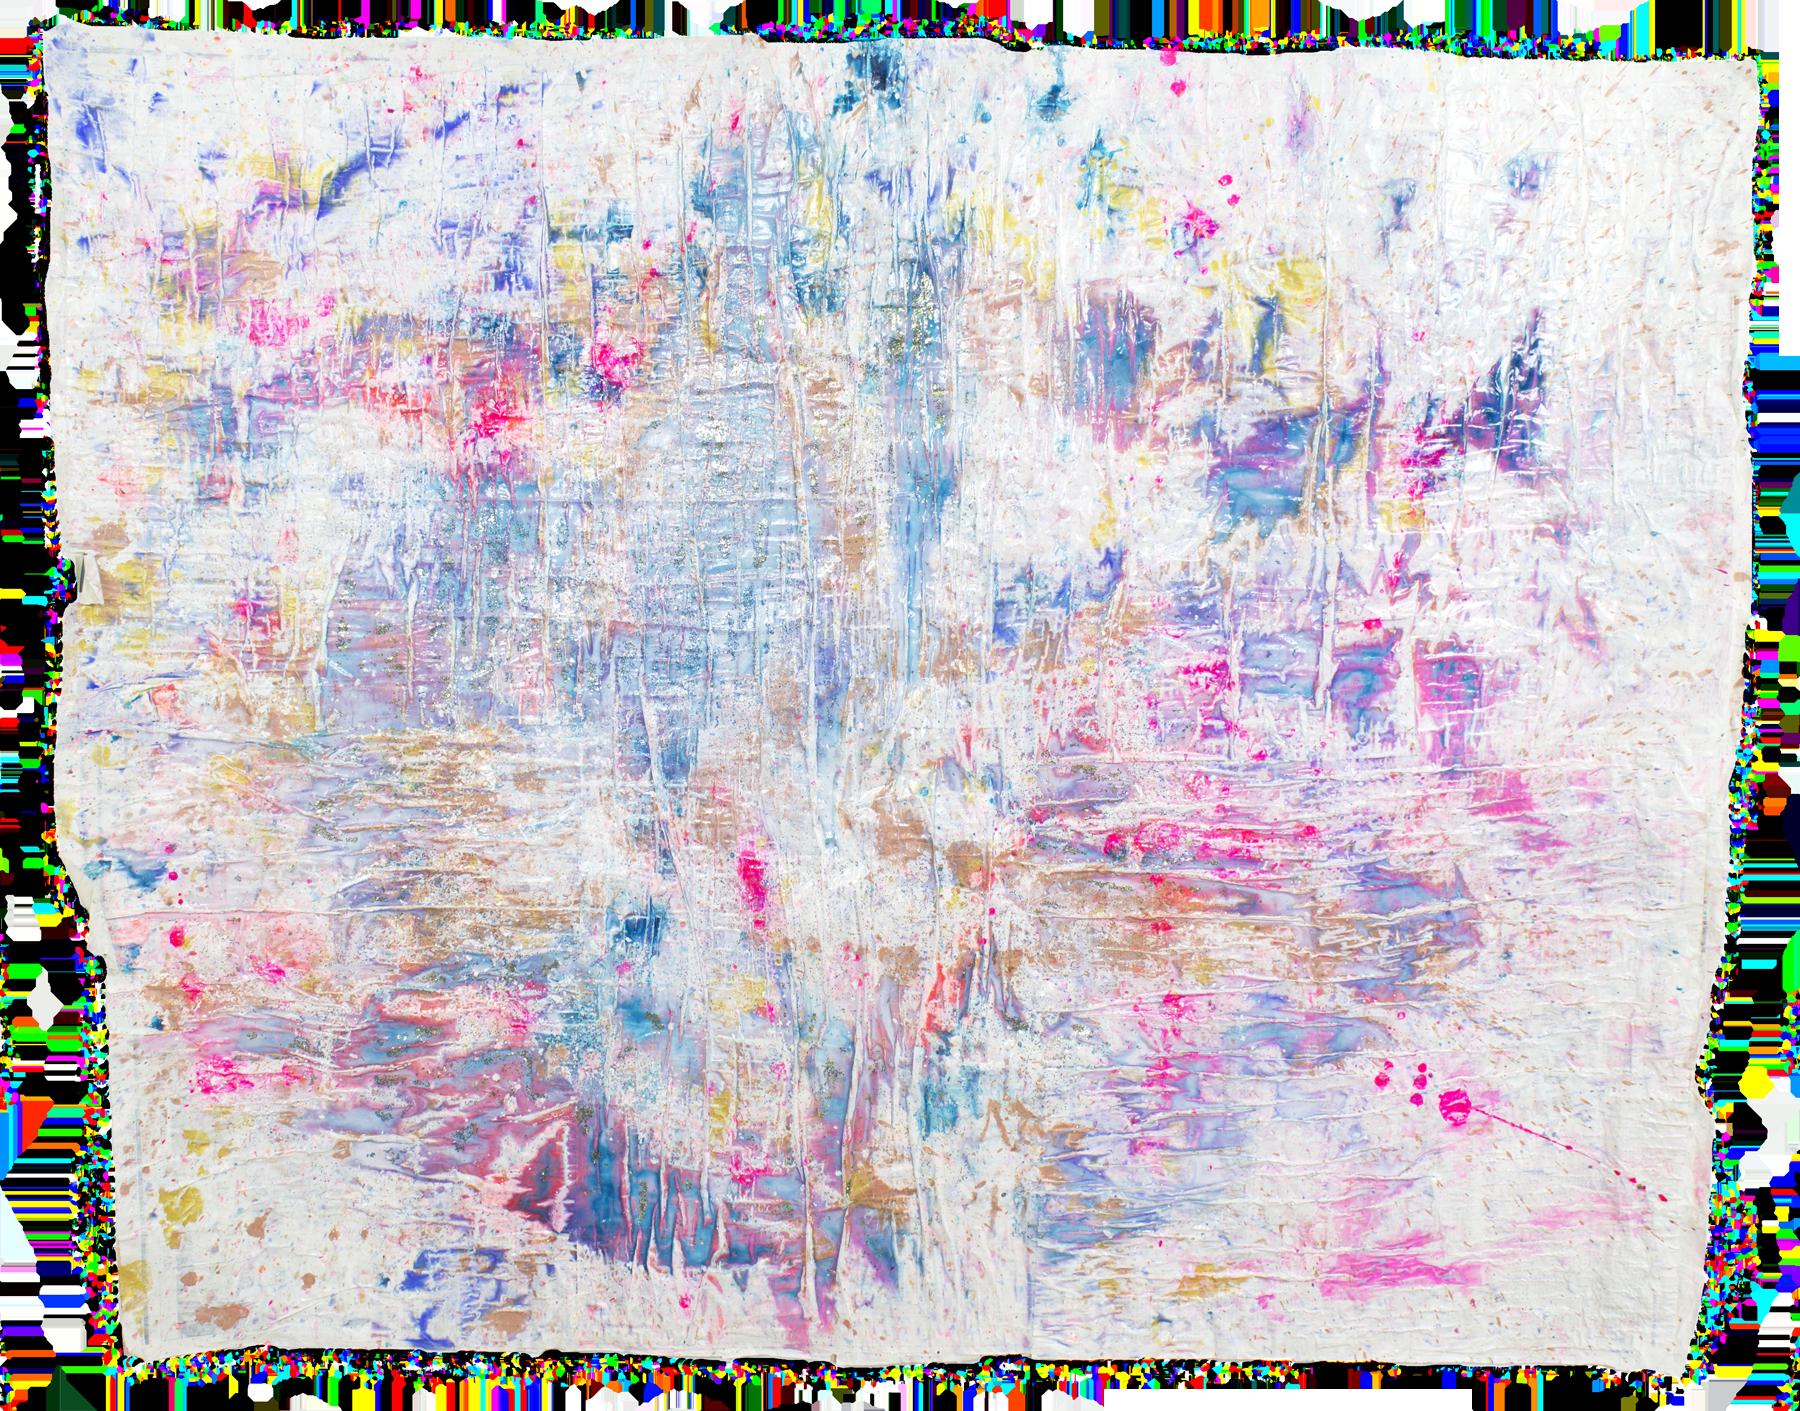 'Sparkling skies NO. 8', 99 x 128 cm, acrylic paint on handmade paper-base, Kerstin Pressler, www.kerstinpressler.com